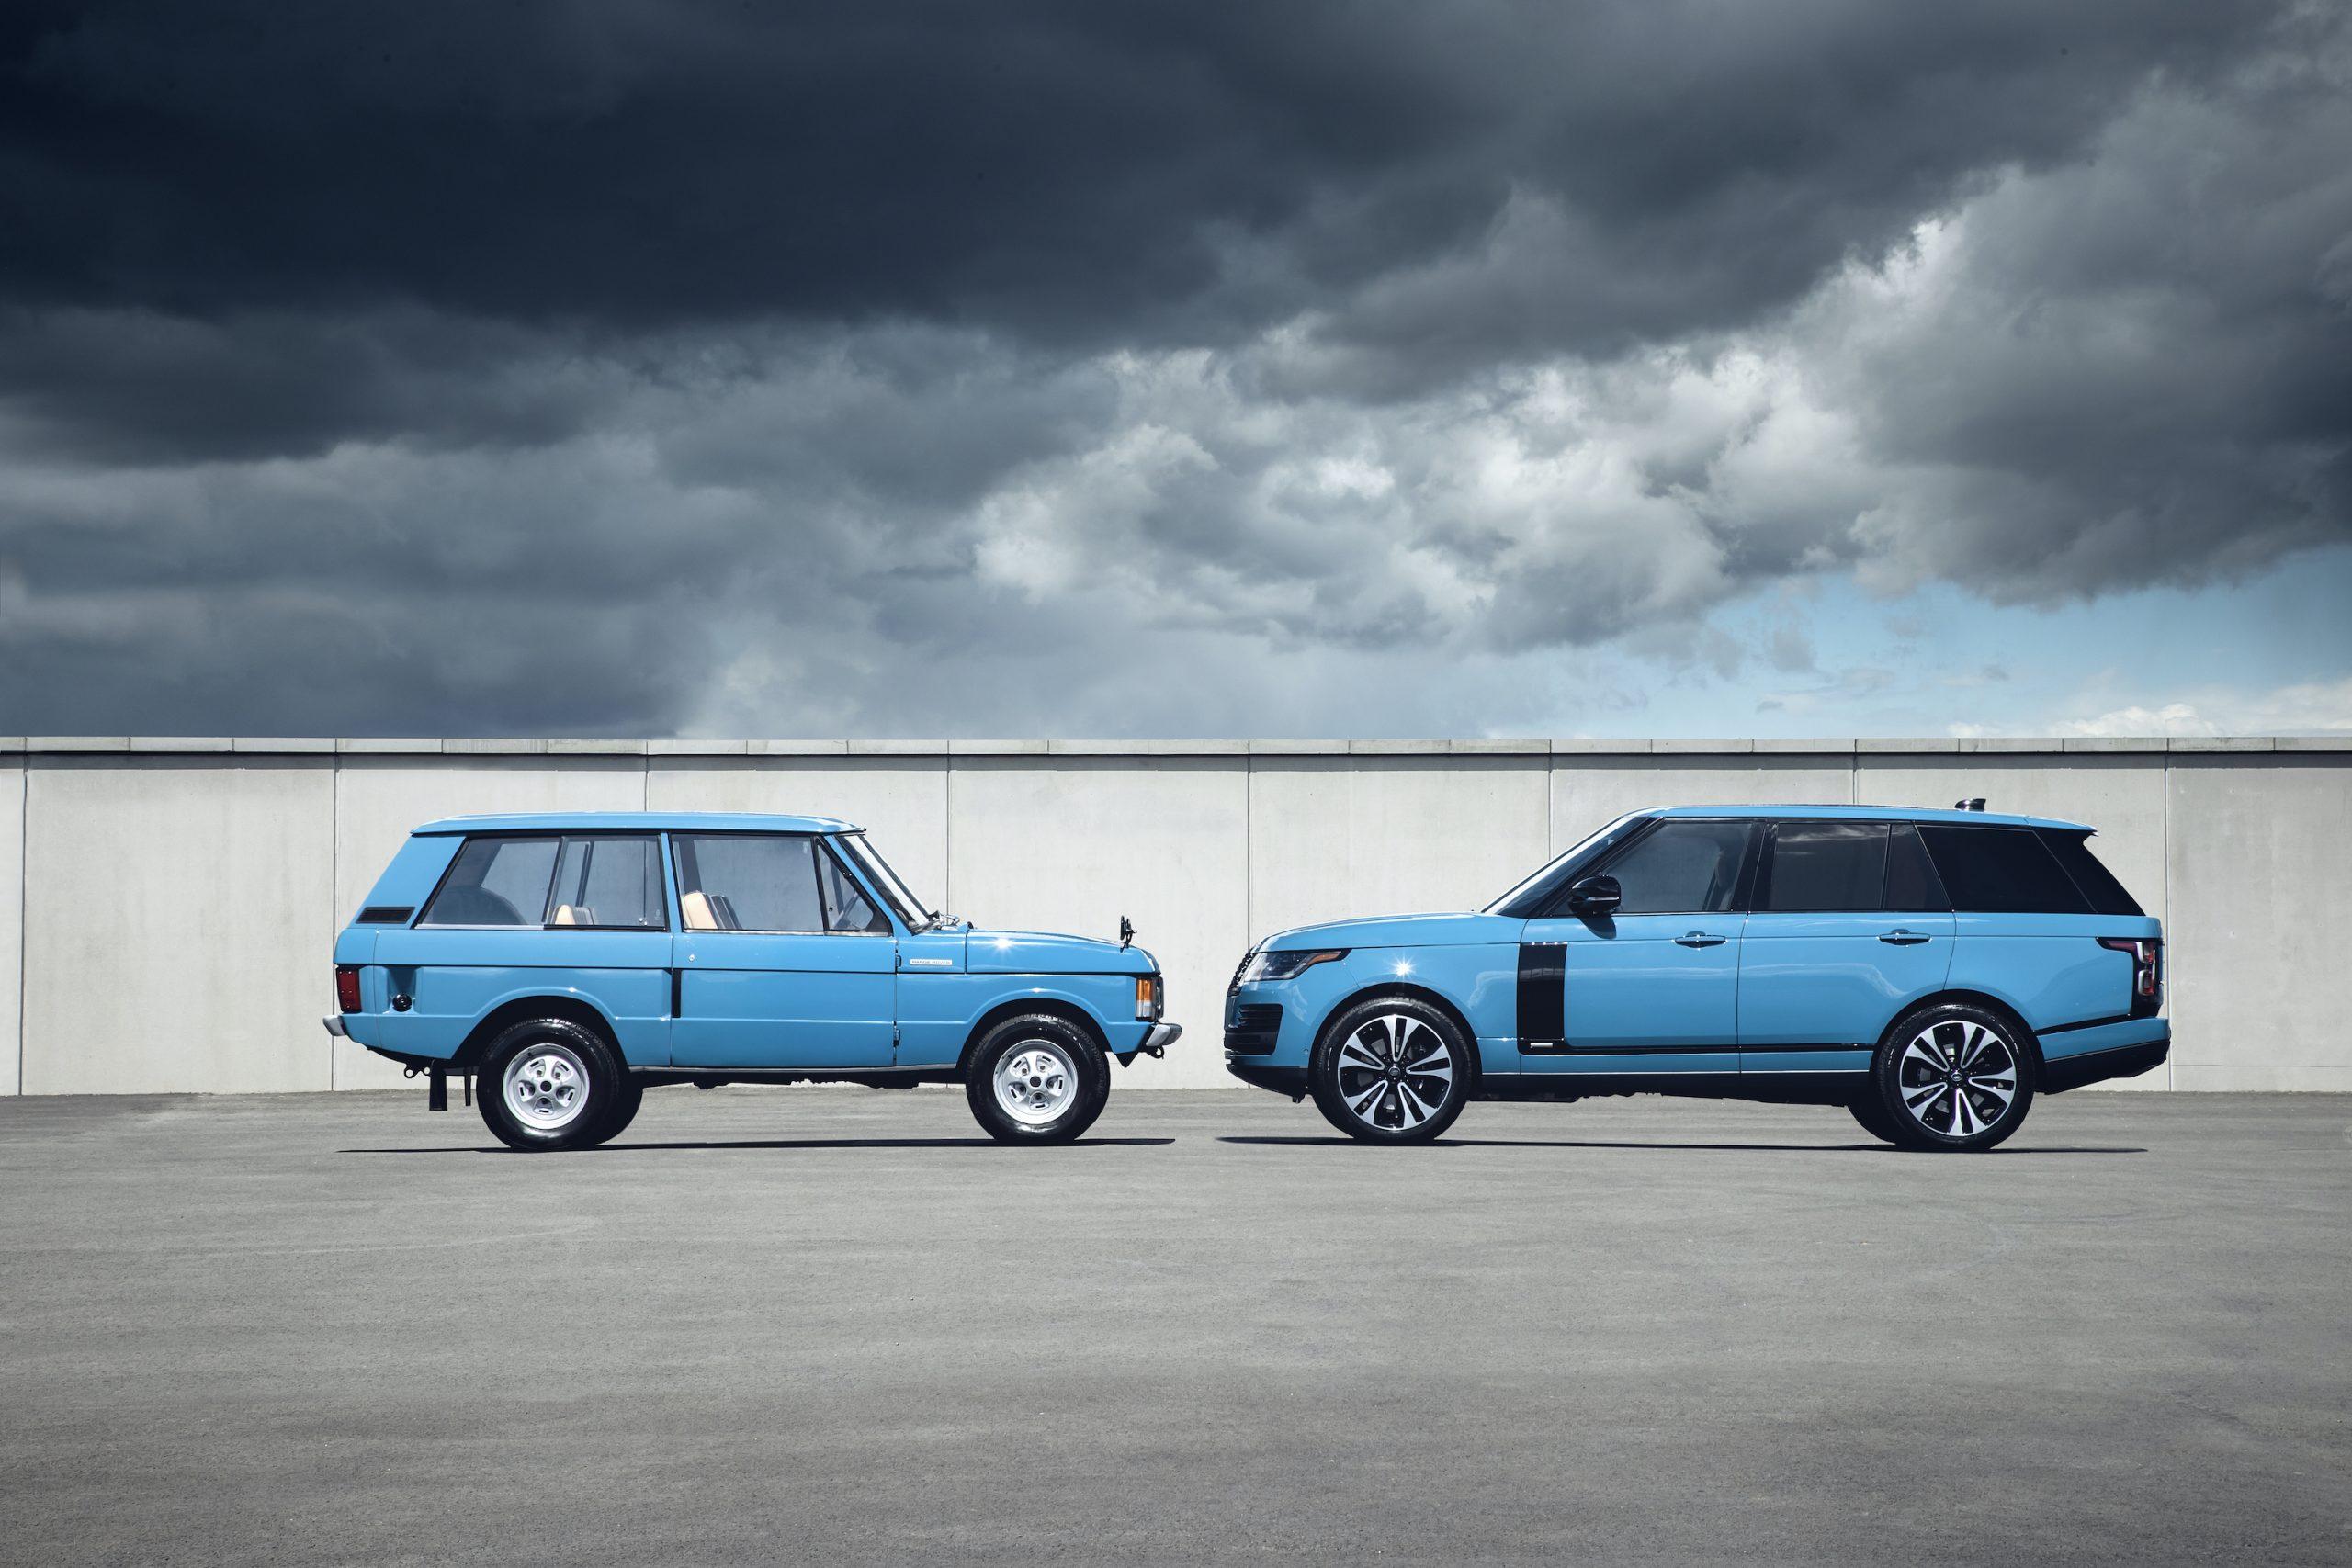 Happy 50th birthday, Range Rover.